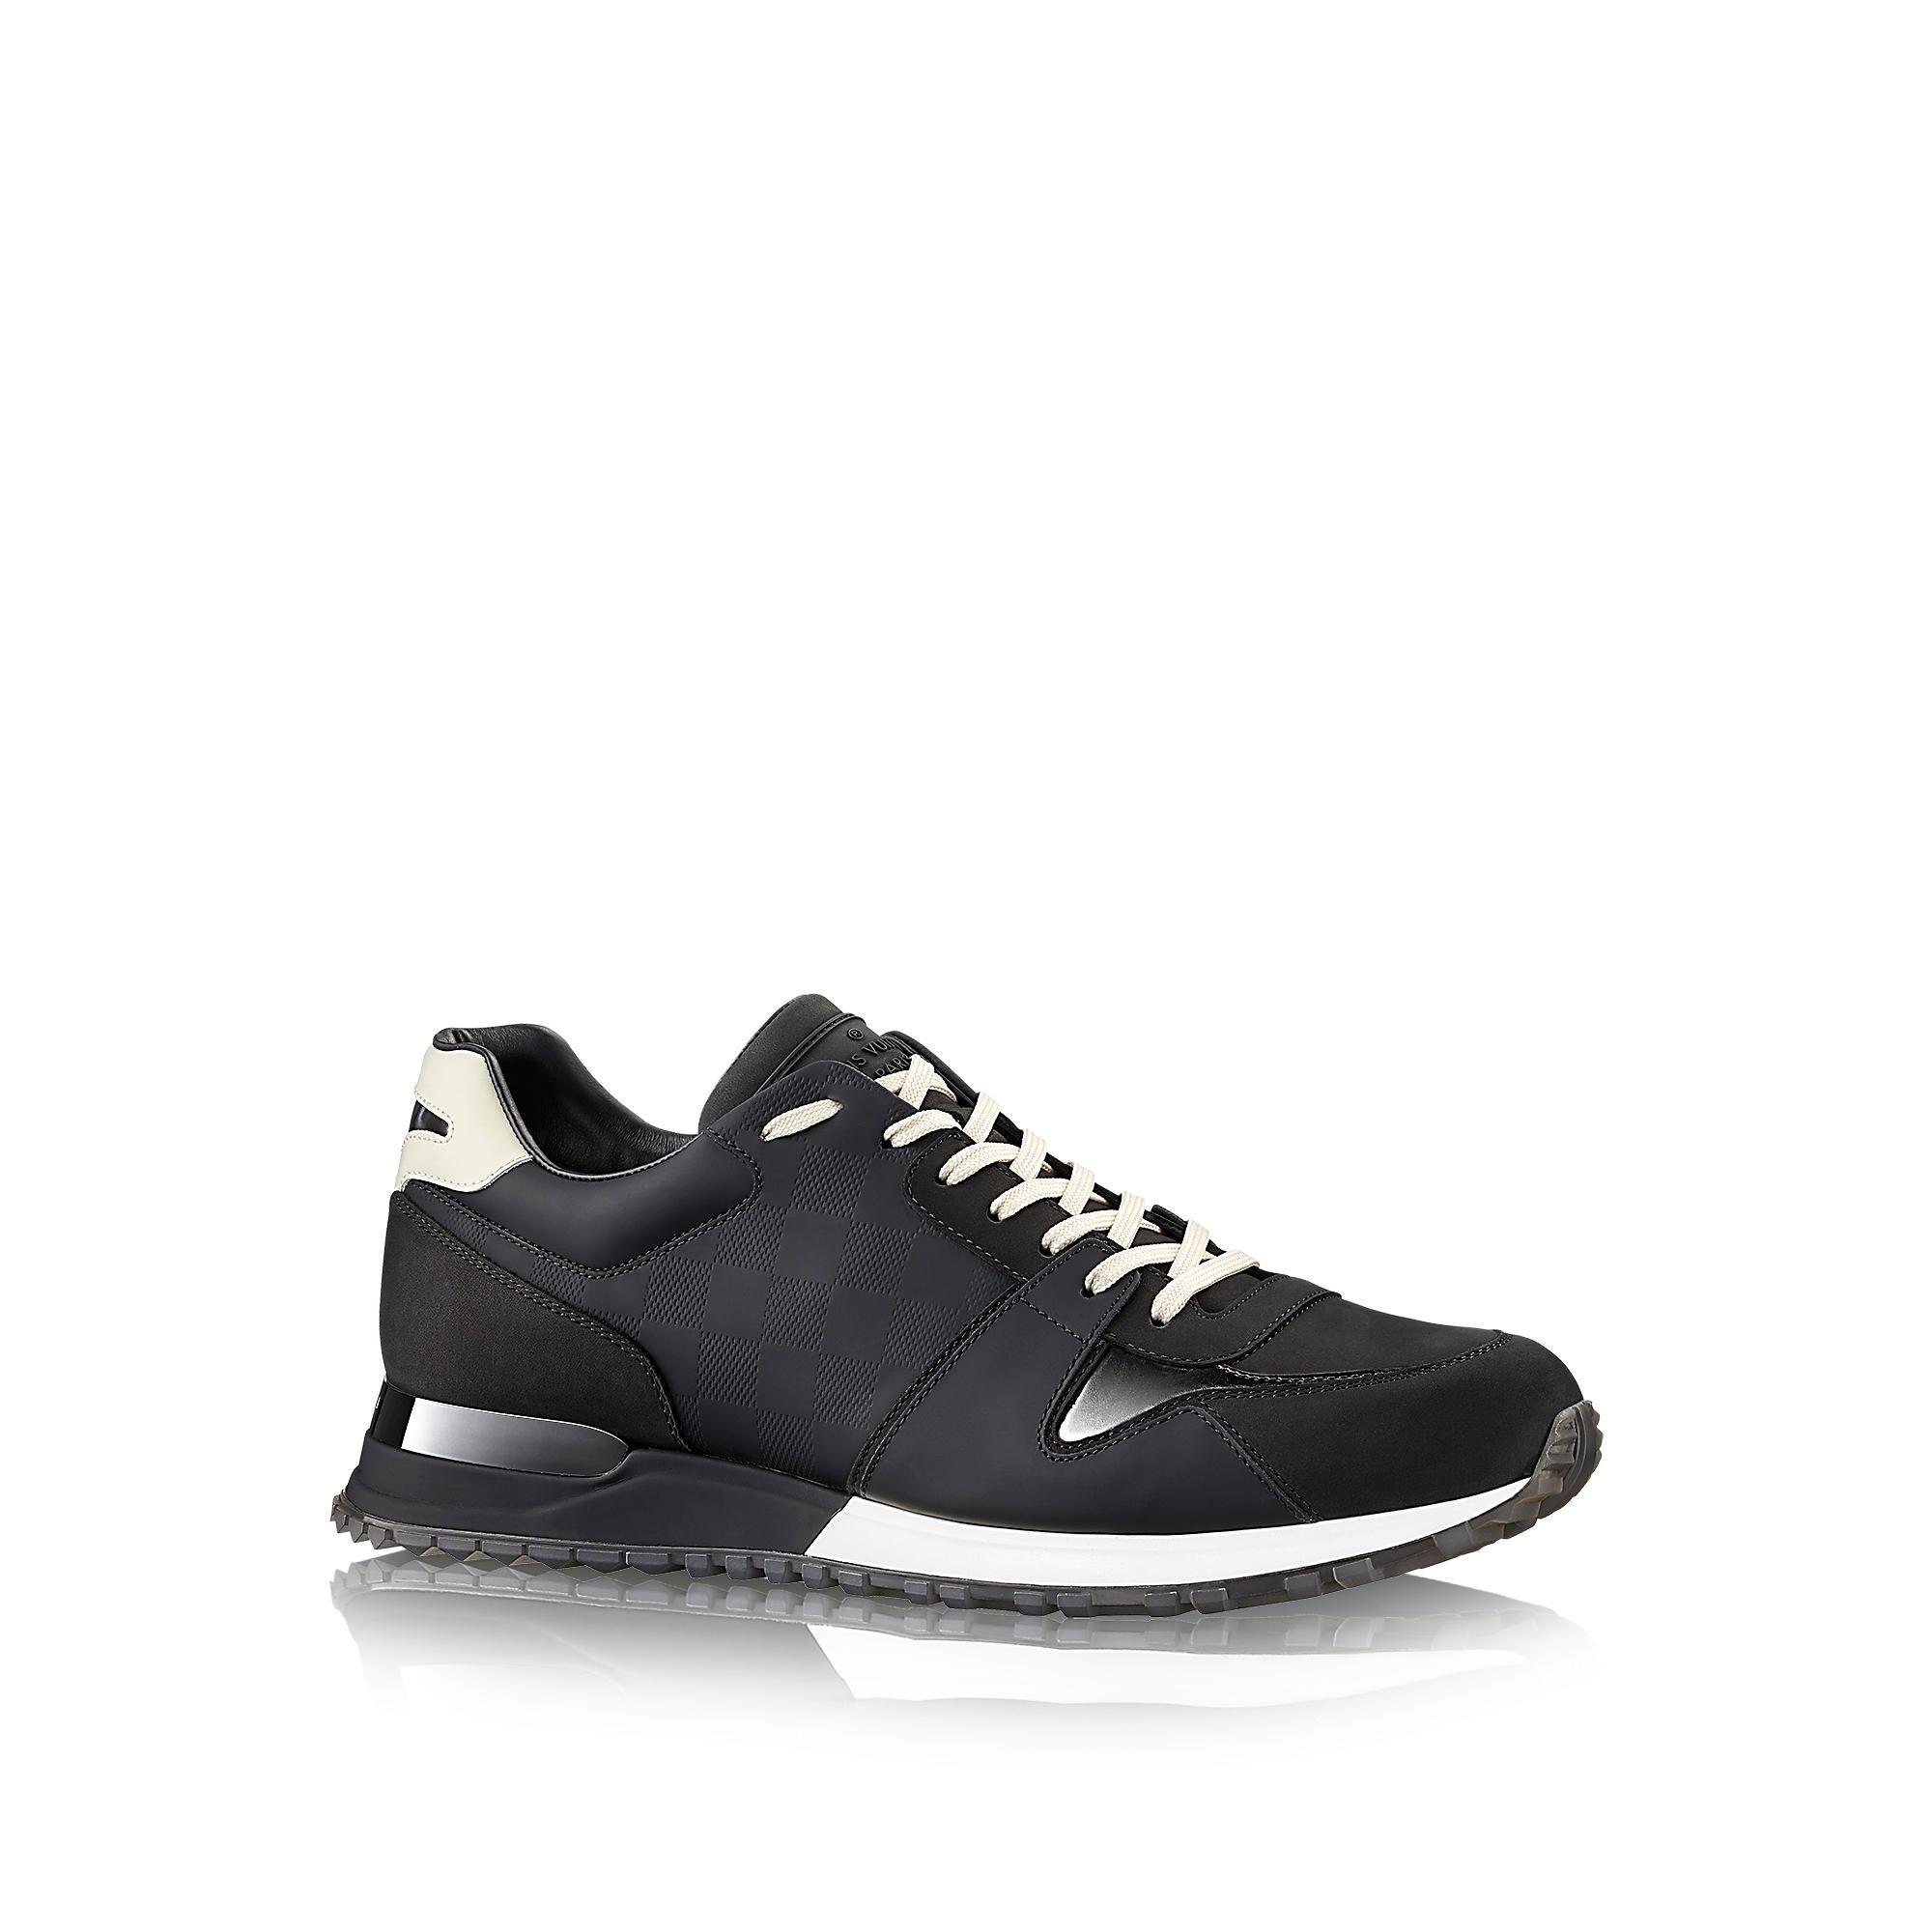 Adidas X Supremo X Lv Nmd R1 Uomo Edizione Speciale Es